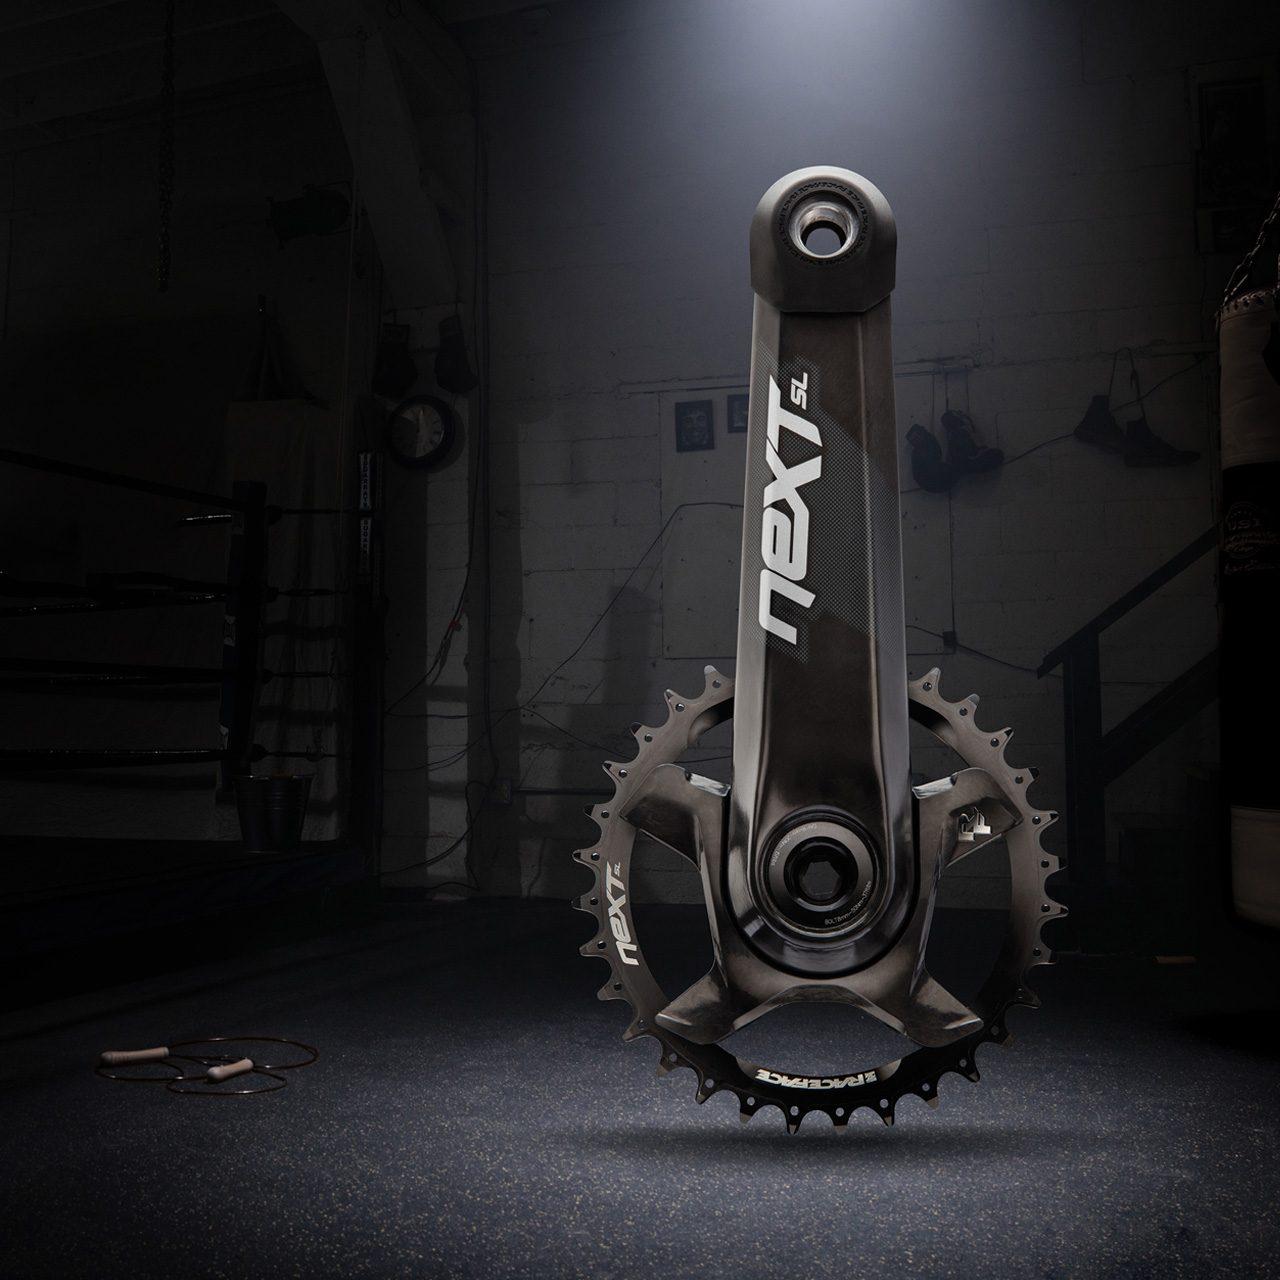 RacefaceNext Bike Crankset